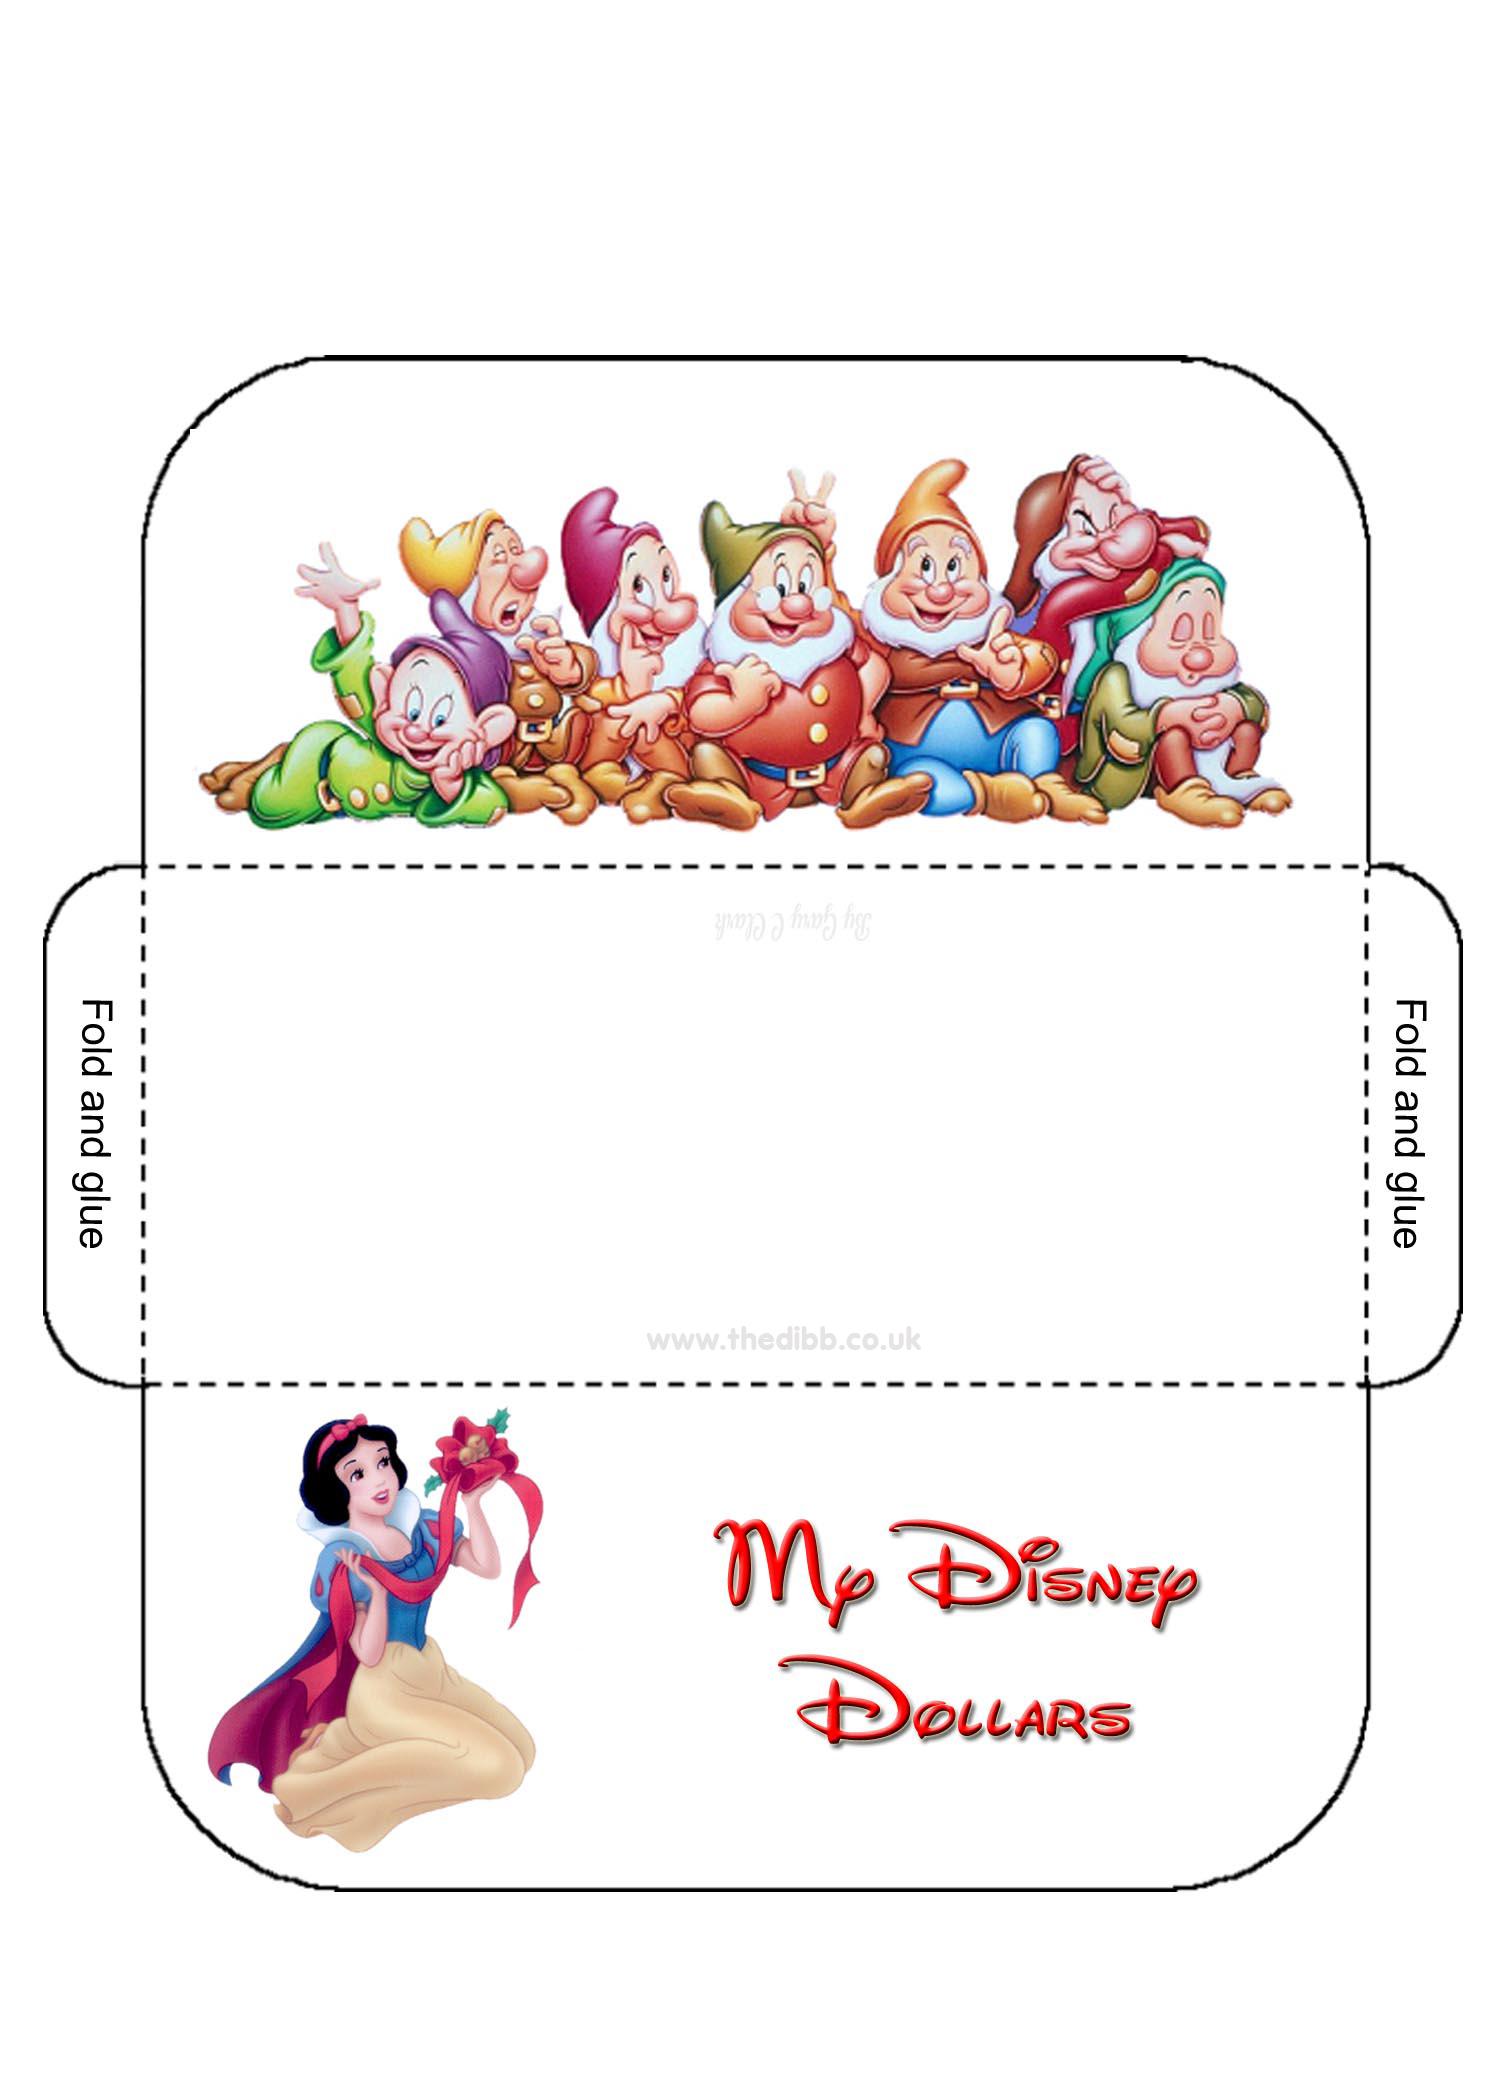 image regarding Disney Printable Envelopes referred to as Disney Greenback Envelopes - theDIBB